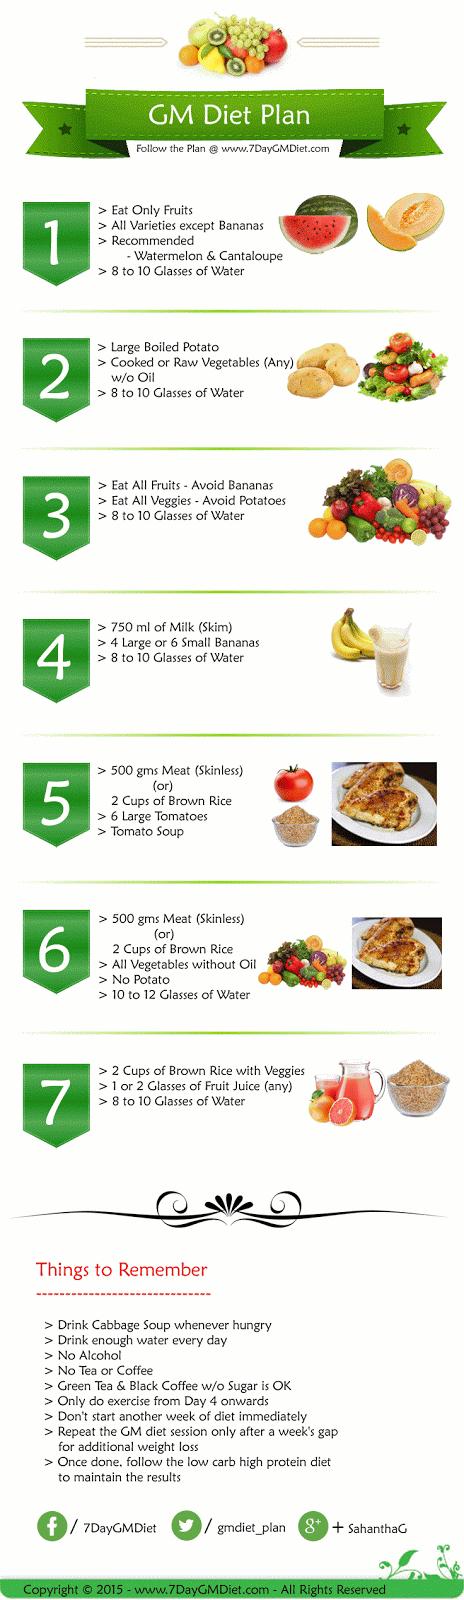 GM Diet Chart Find the GM Diet Plan PDF Printable Version